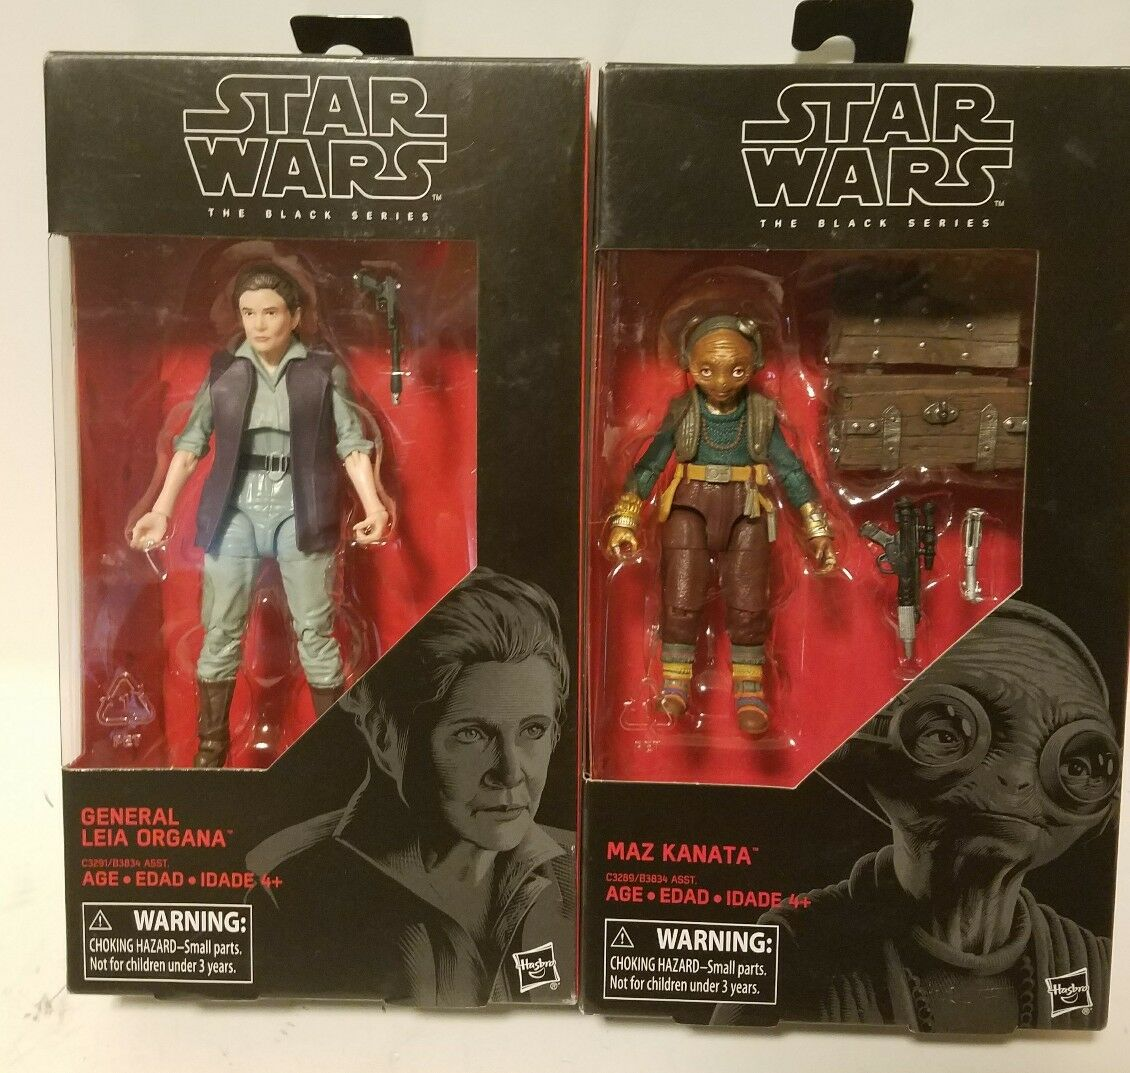 Star Wars Leia Organa & negro Series general Maz Kanata